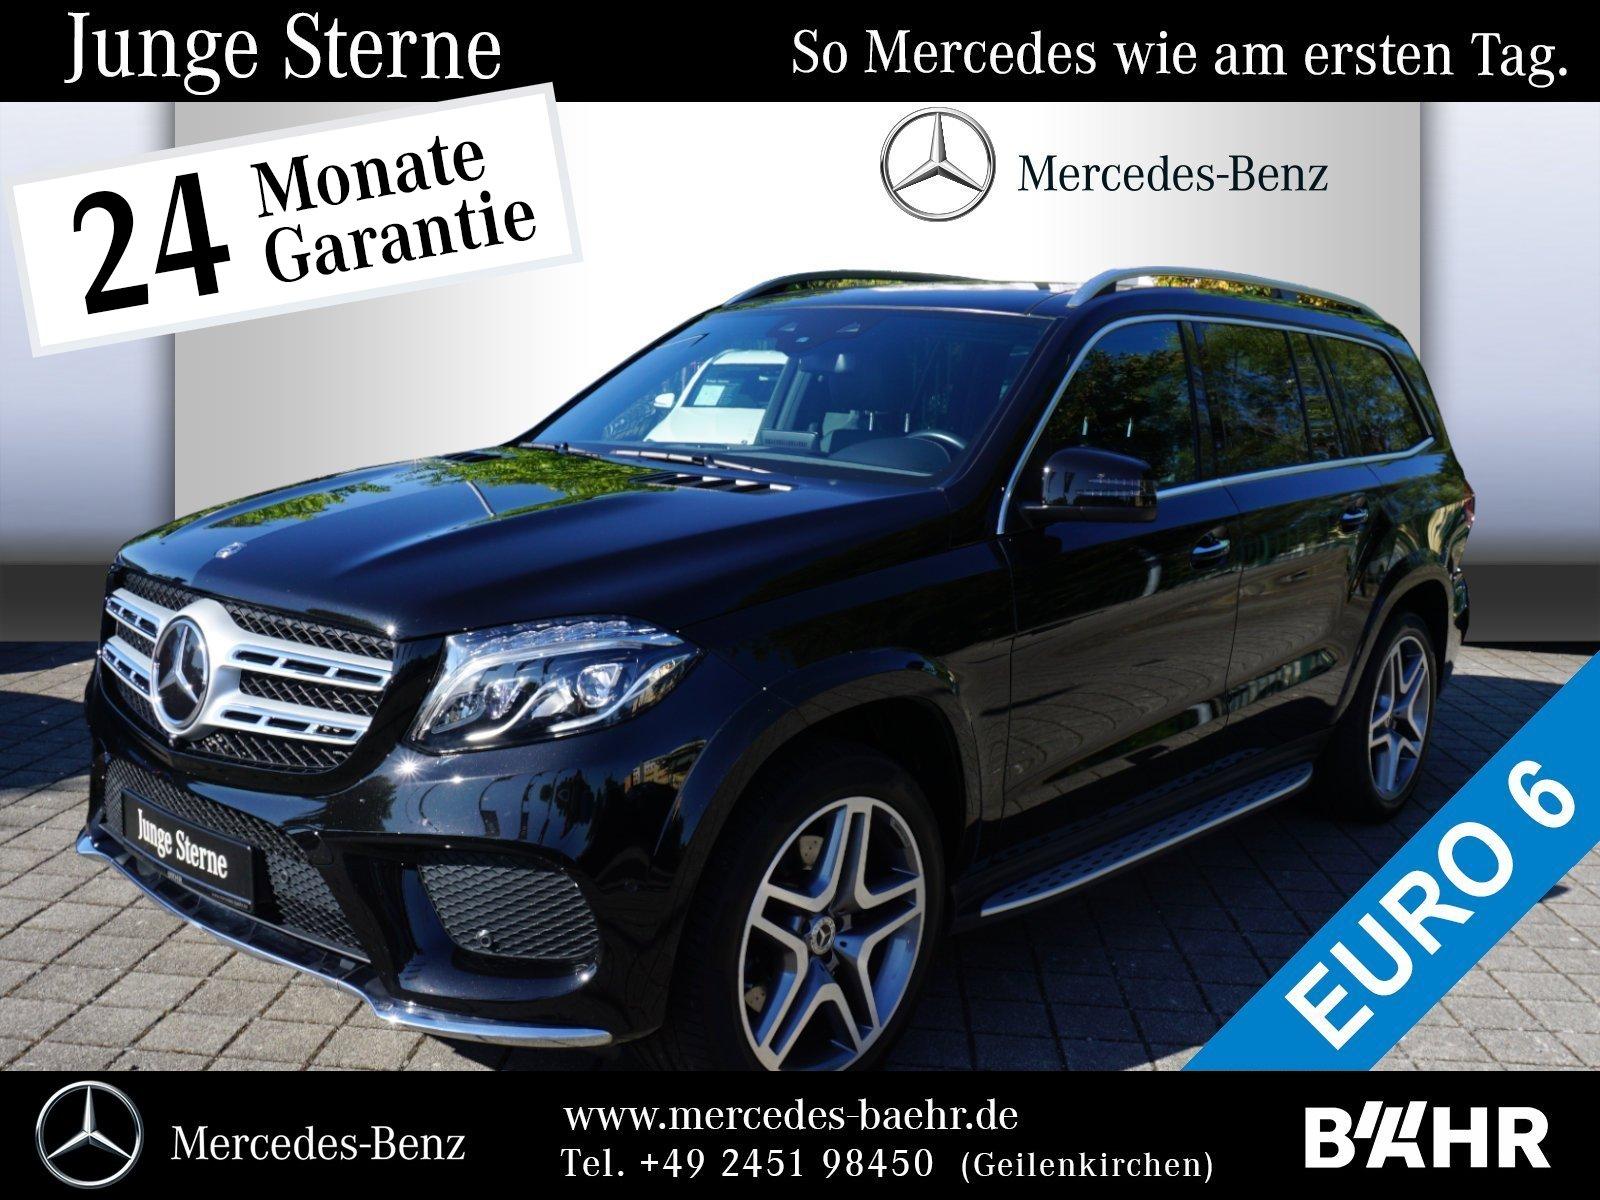 Mercedes-Benz GLS 500 4M AMG/Comand/ILS/360°/Pano/Airmatic/AHK, Jahr 2017, petrol